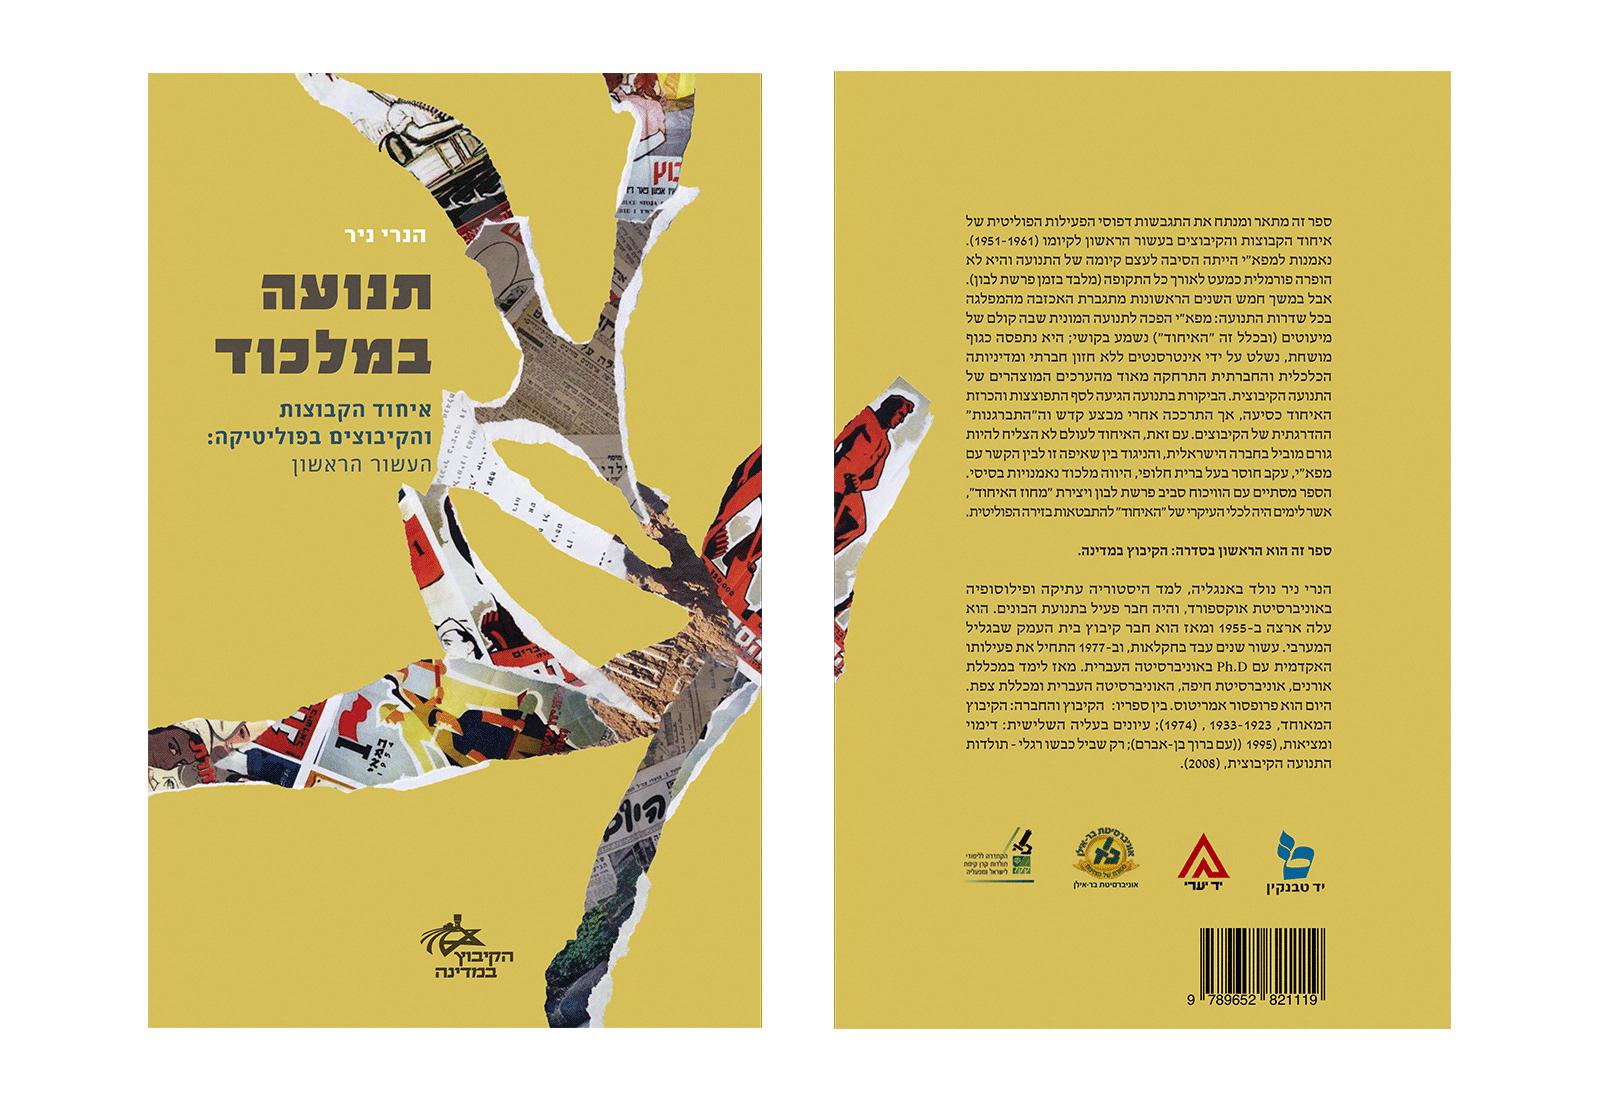 http://bigeyes.co.il/wp-content/uploads/2019/08/kibbutz-books-3.png